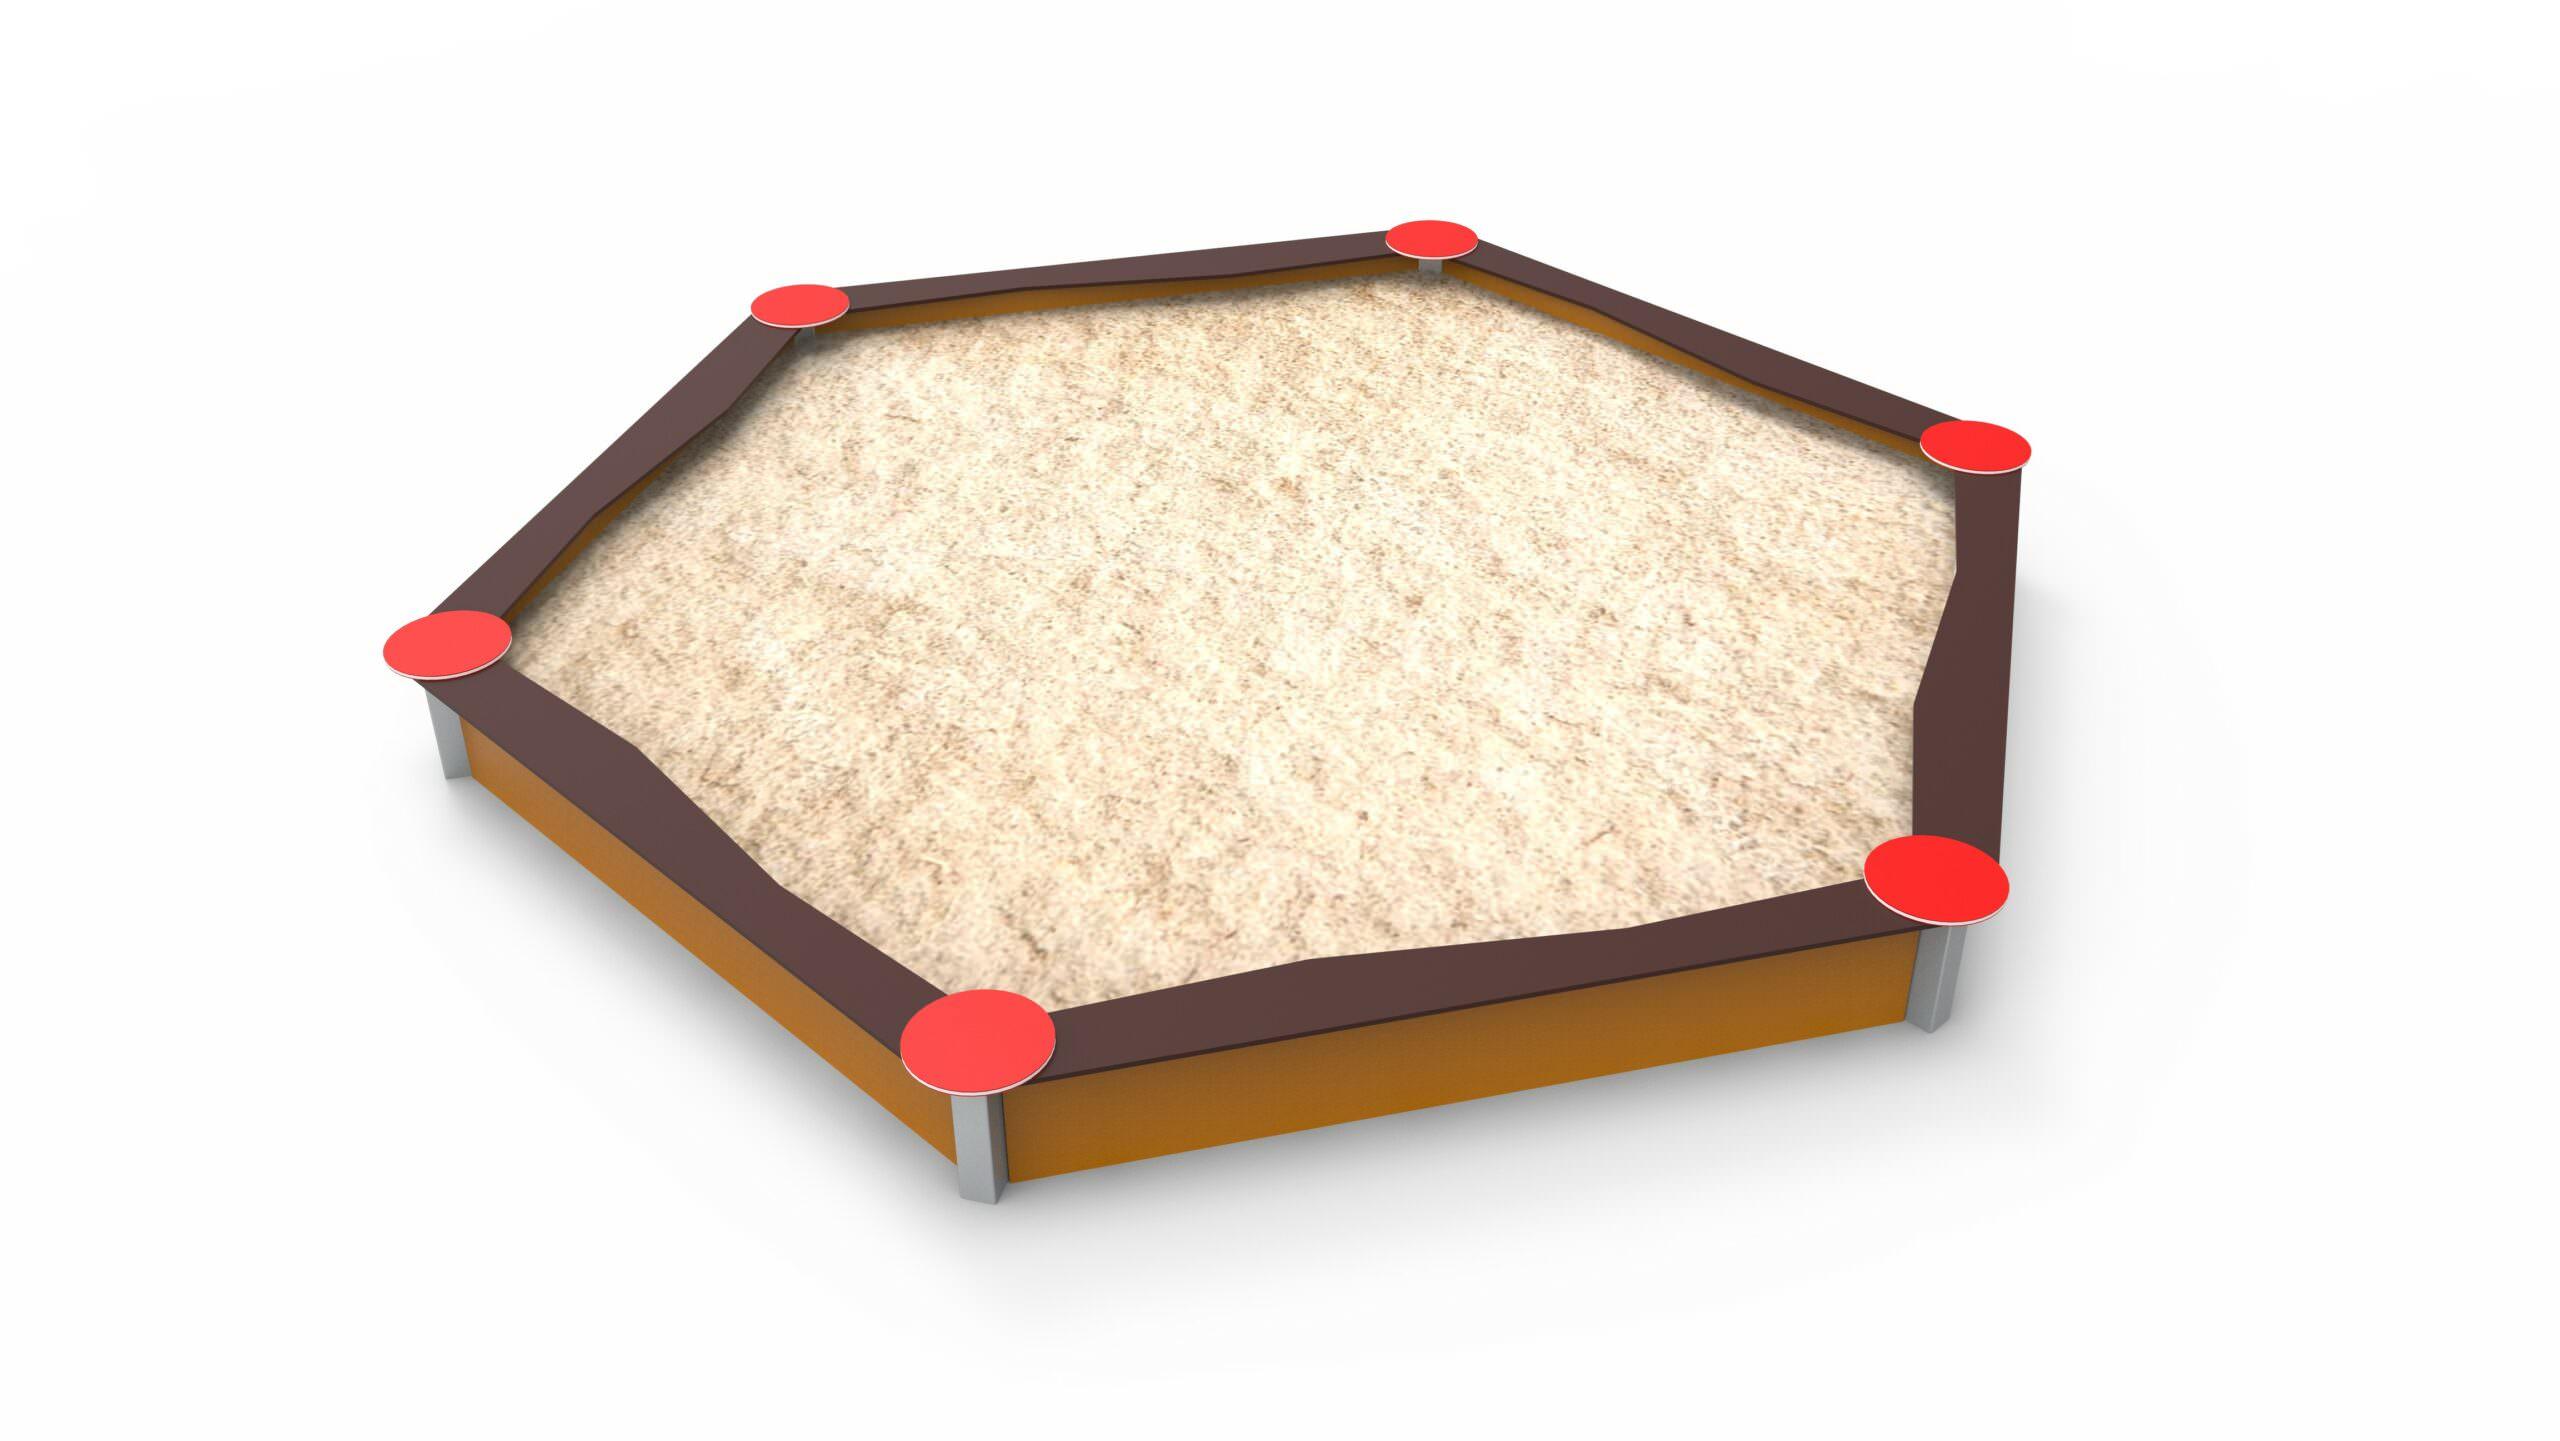 Hexagonal Big Sandbox 2,4 M